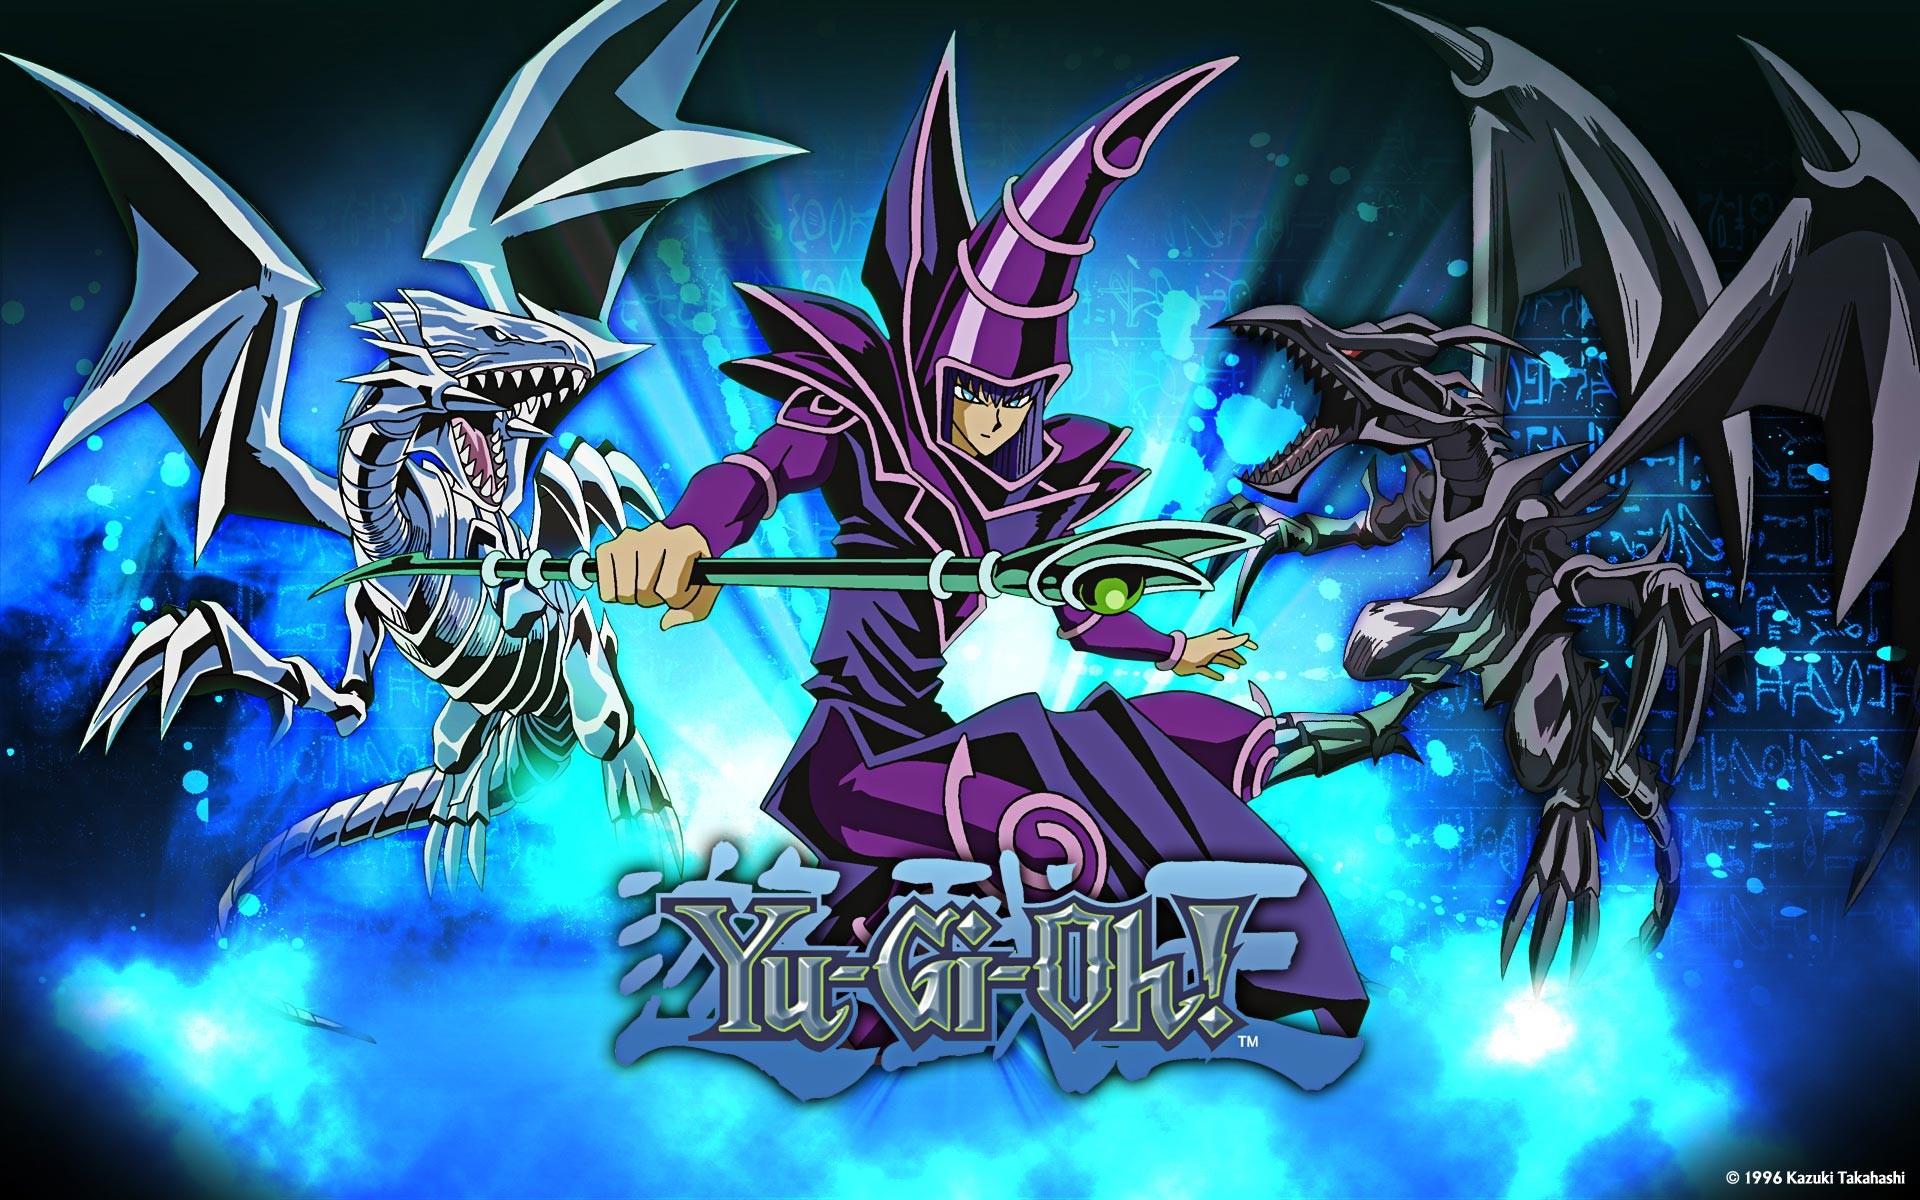 Dark Magician Yugioh Wallpaper | Best Cool Wallpaper HD Download